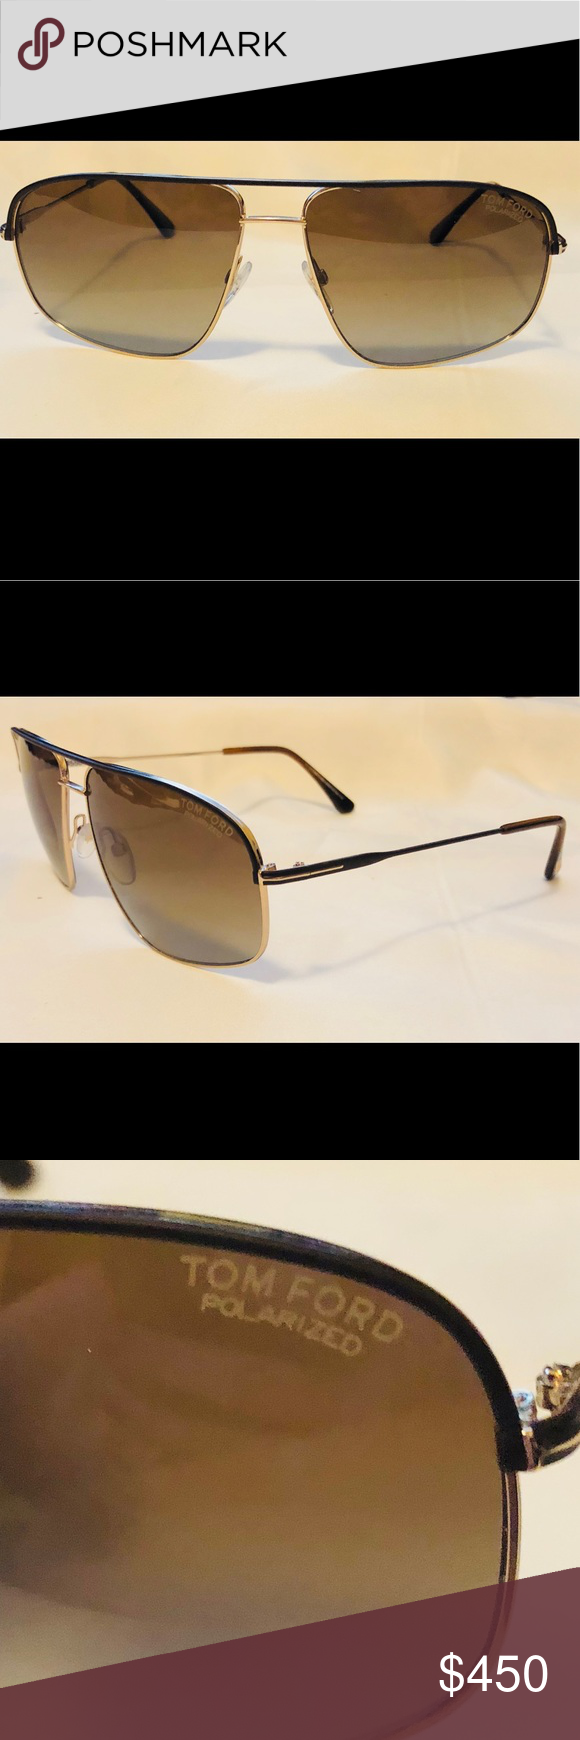 53b358d14c New Polarized Tom Ford FT467 Justin Sunglasses Condition  New Brand  Tom  Ford Gender  Unisex Series Number – FT467 Justin Color Code – 50H Frame  Color  Dark ...